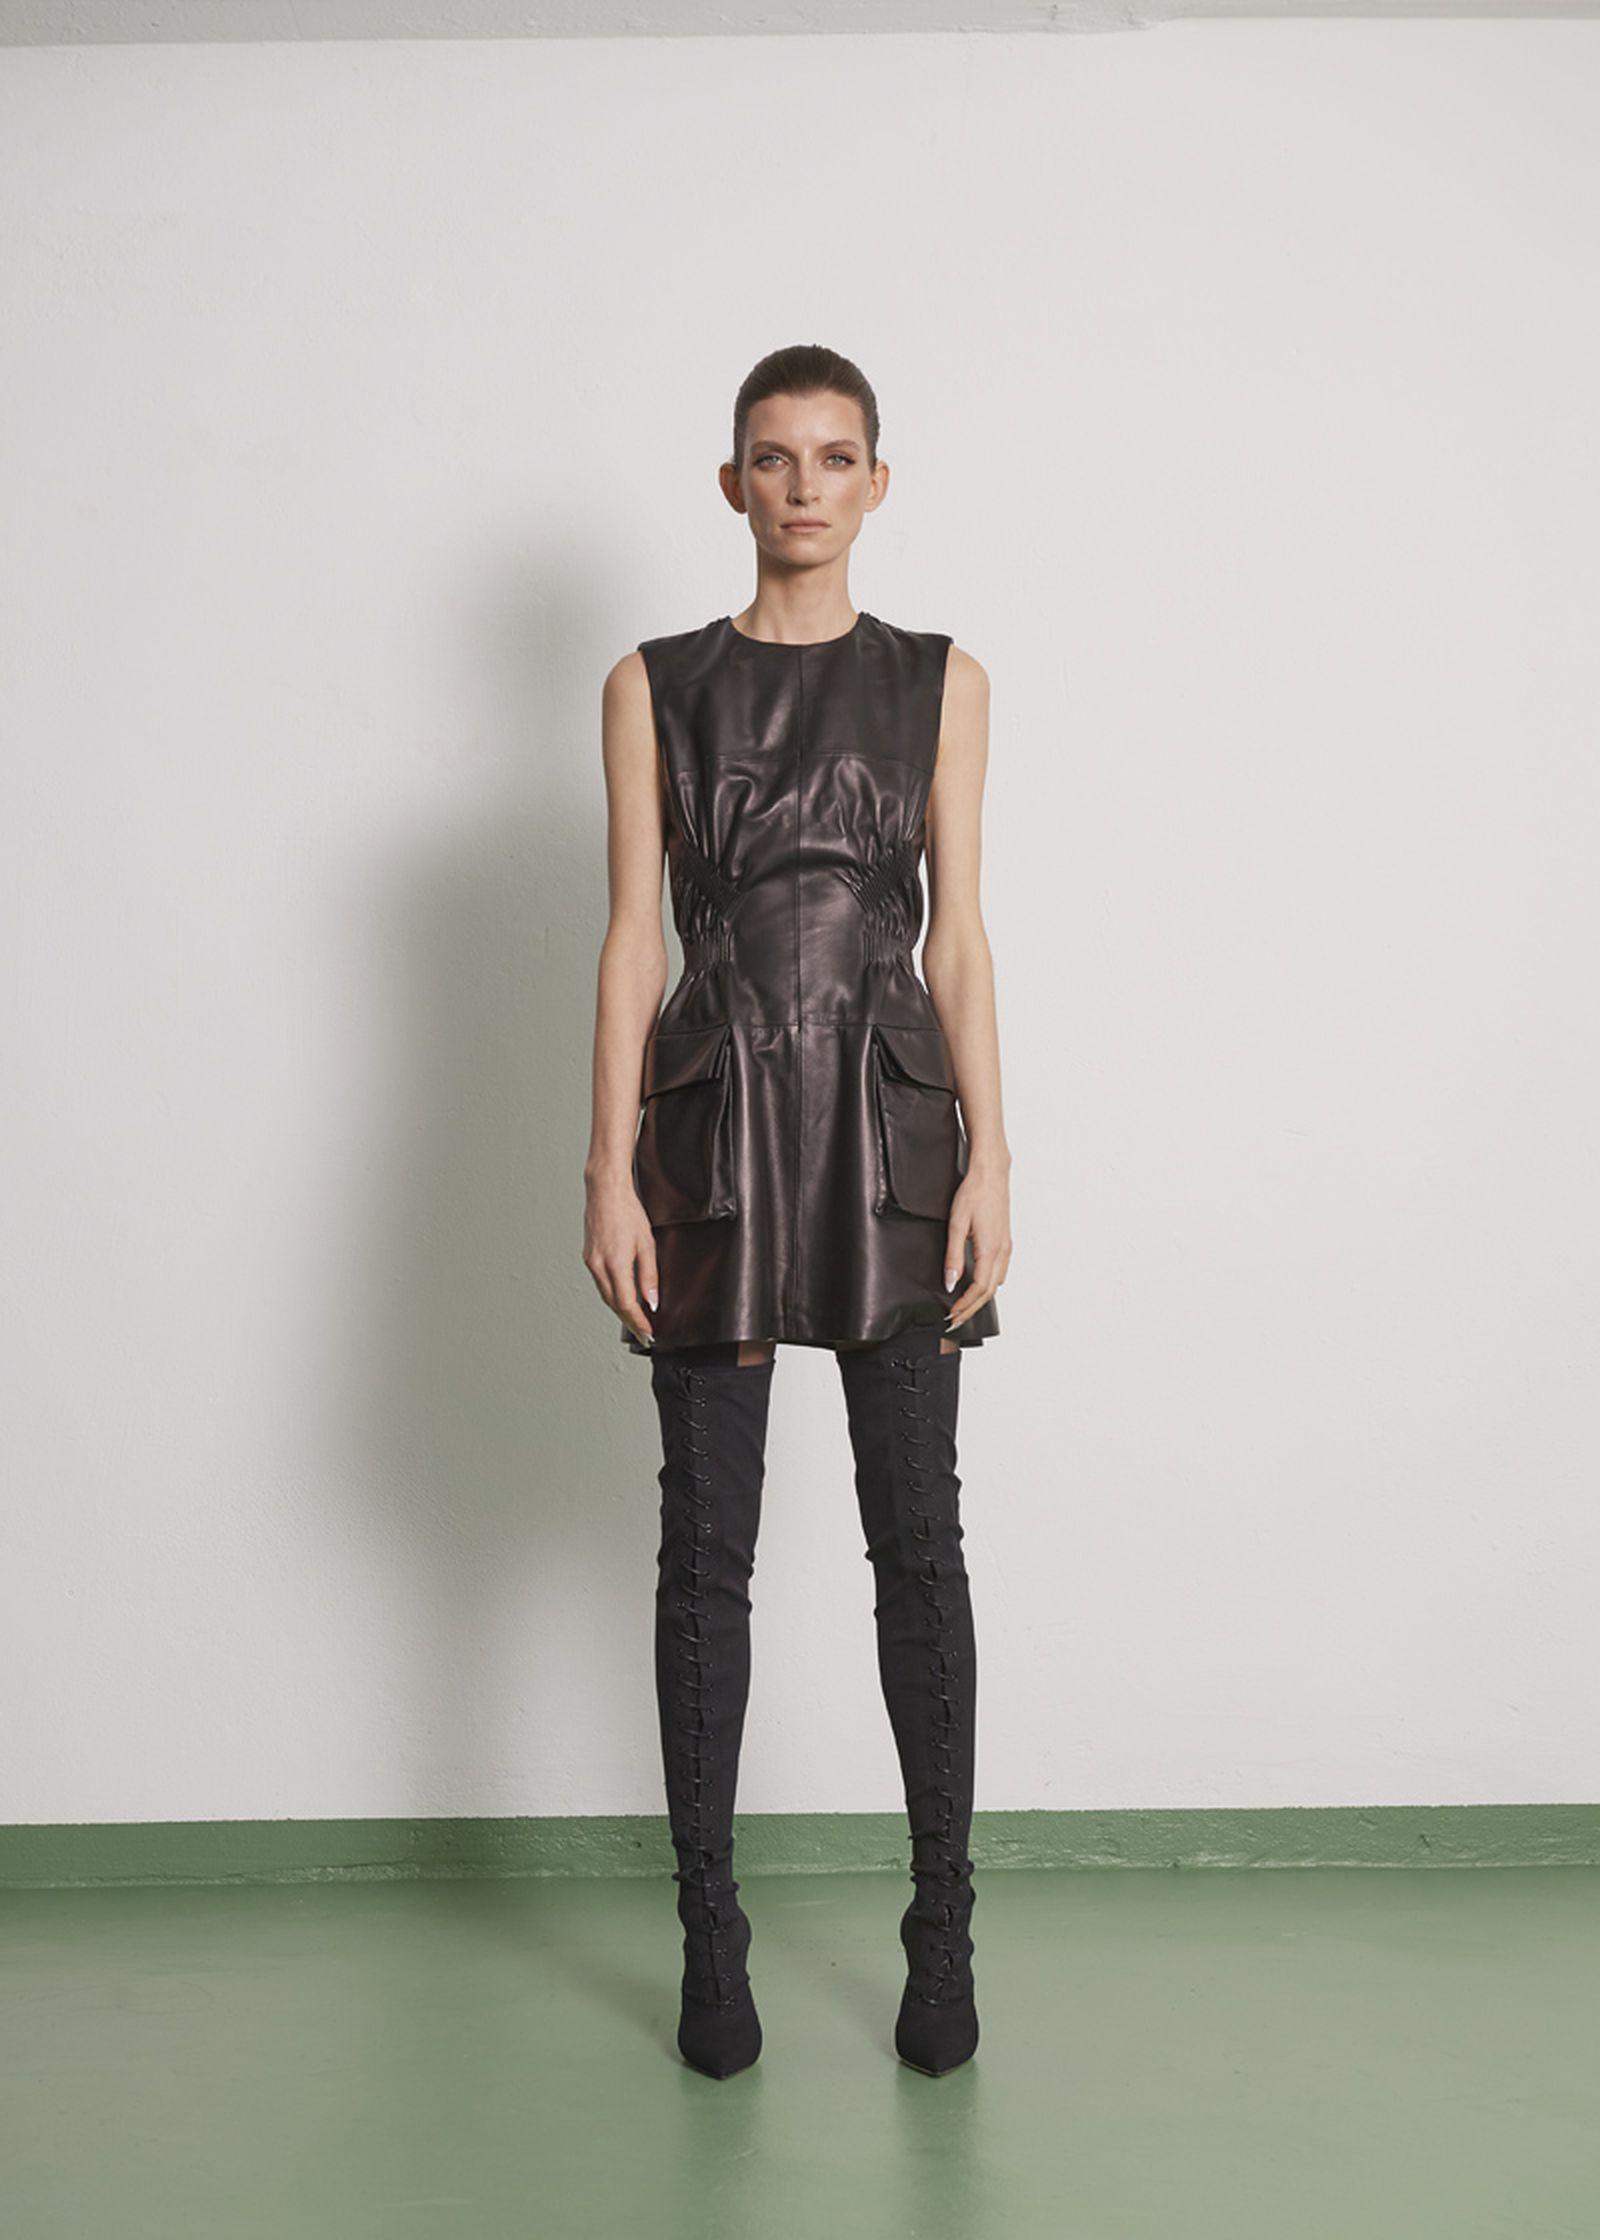 032c-rtw-womenswear-collection-paris-17